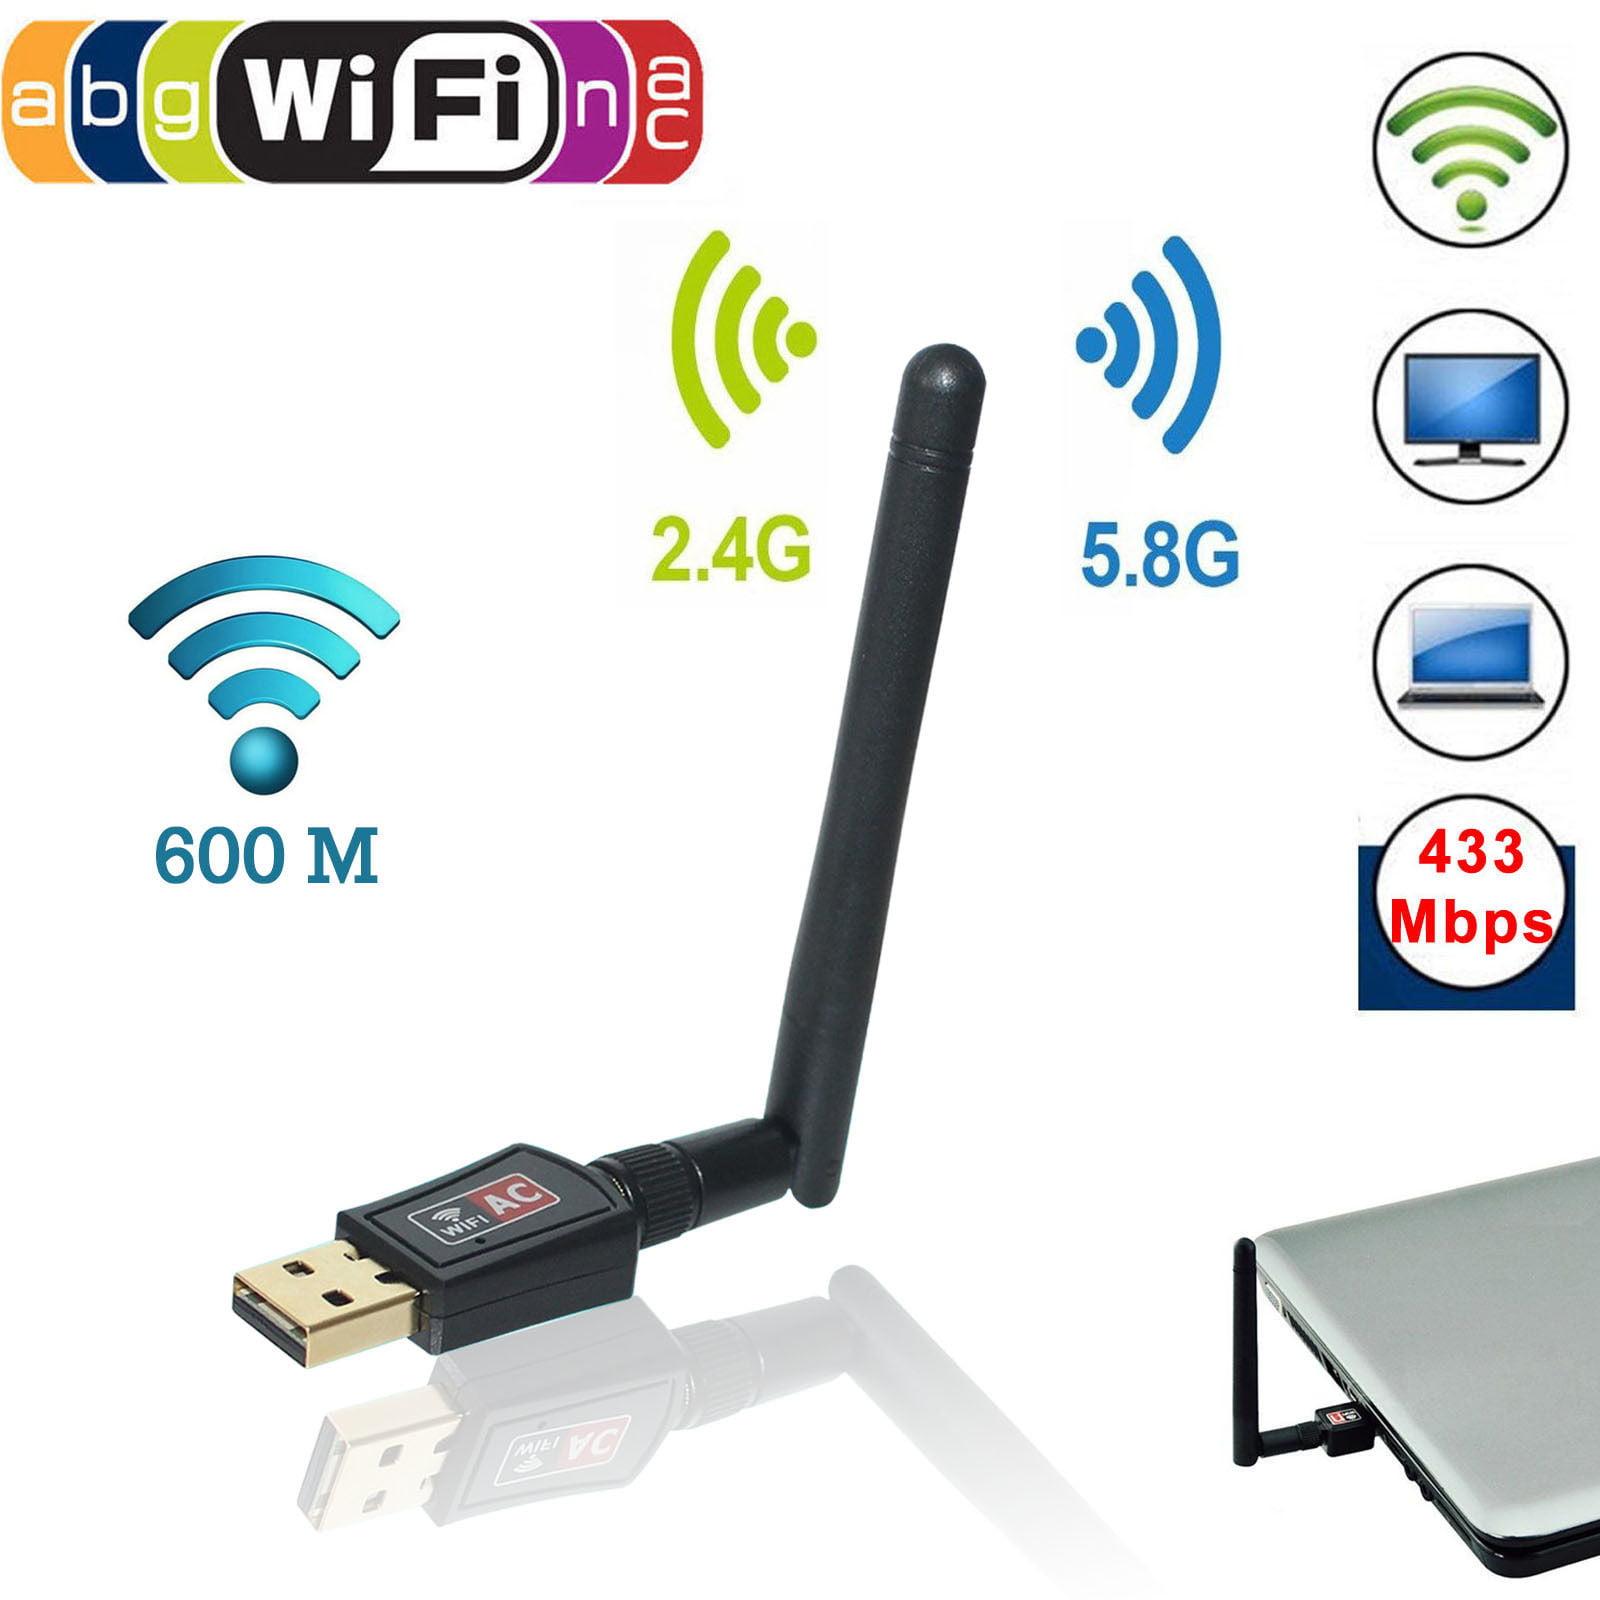 Usb Wi Fi Adapters Wifi Antenna 80211n Wireless Adapter Dongle 150 M